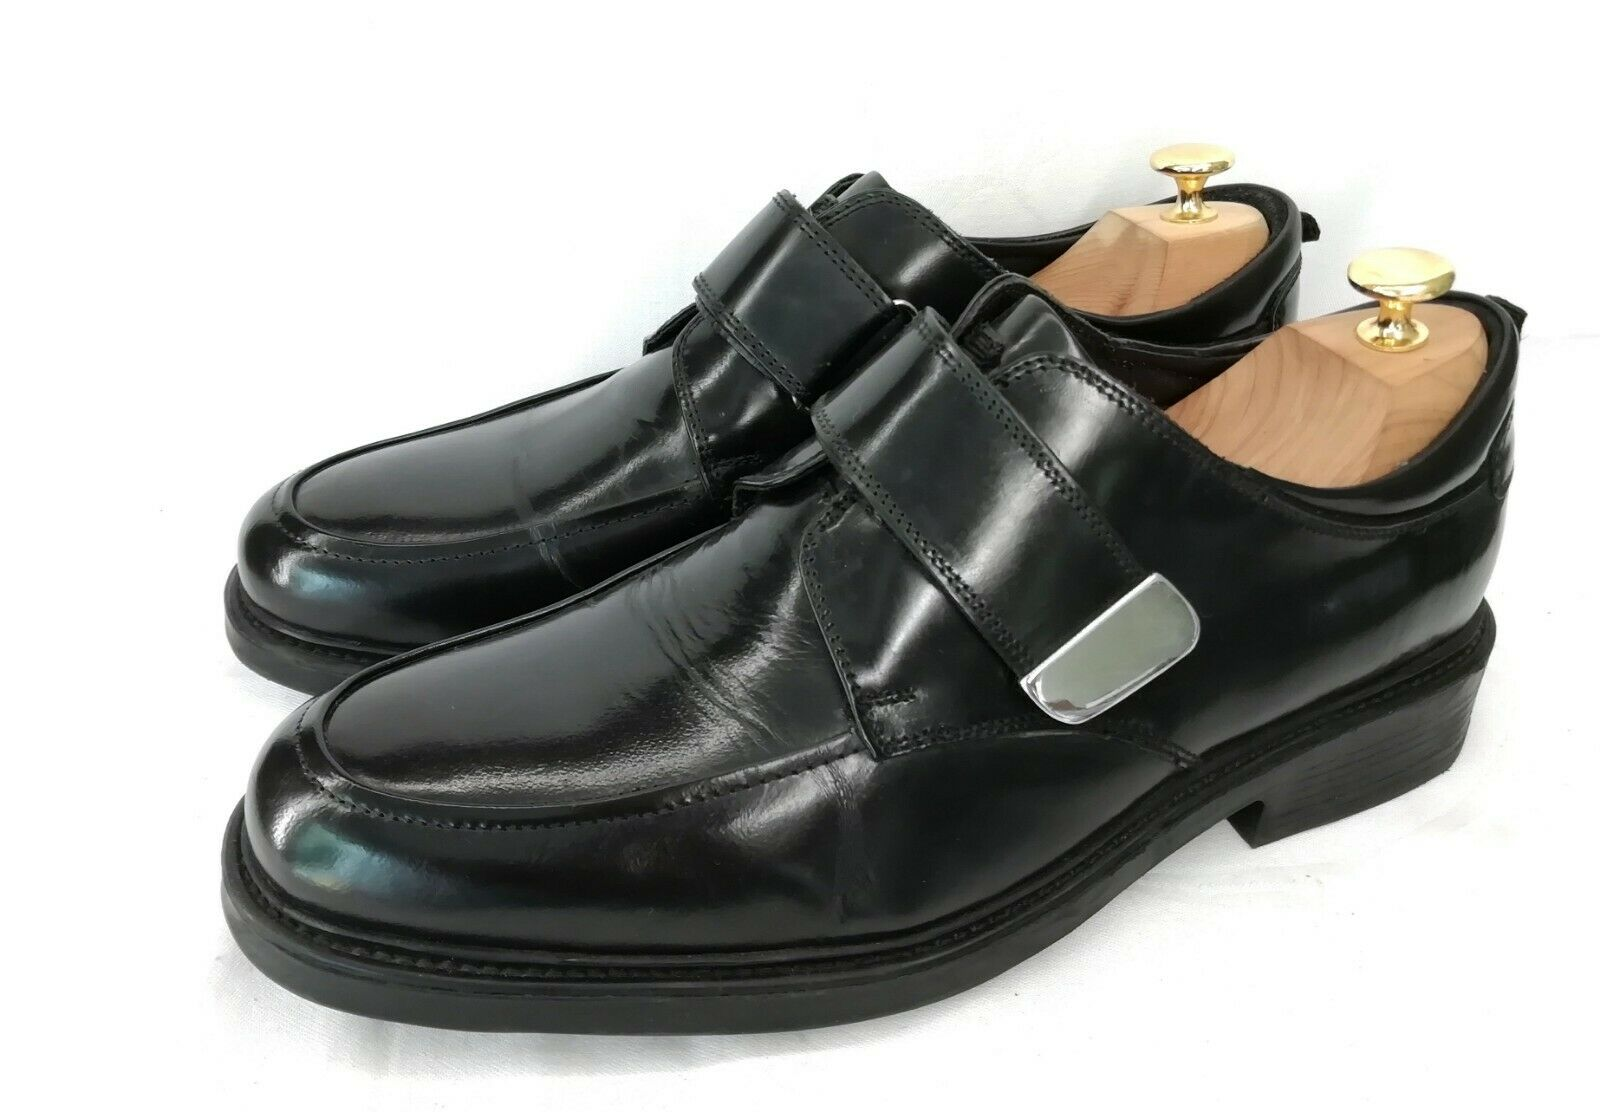 Barisal Business Loafer Herrenschuhe Apron Toe Klettverschluss Schwarz Leder 45